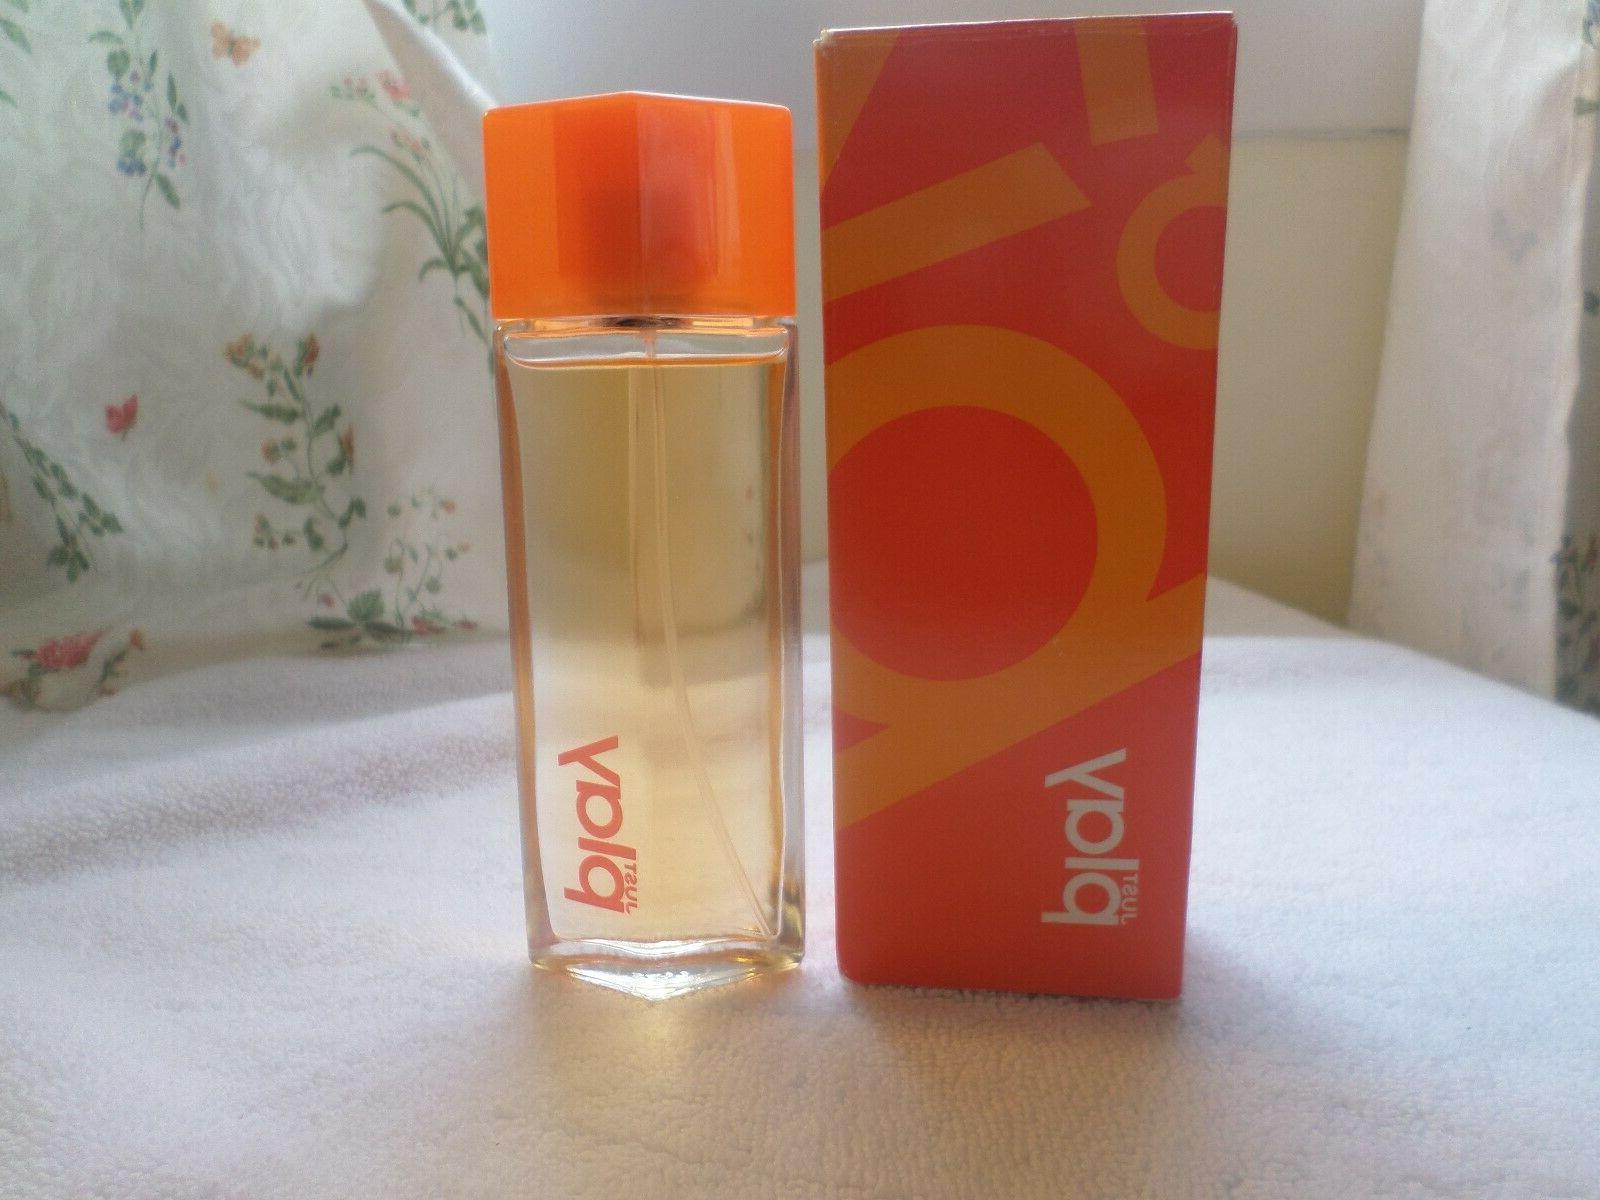 Discontinued Avon Fragrances Fragrancesi